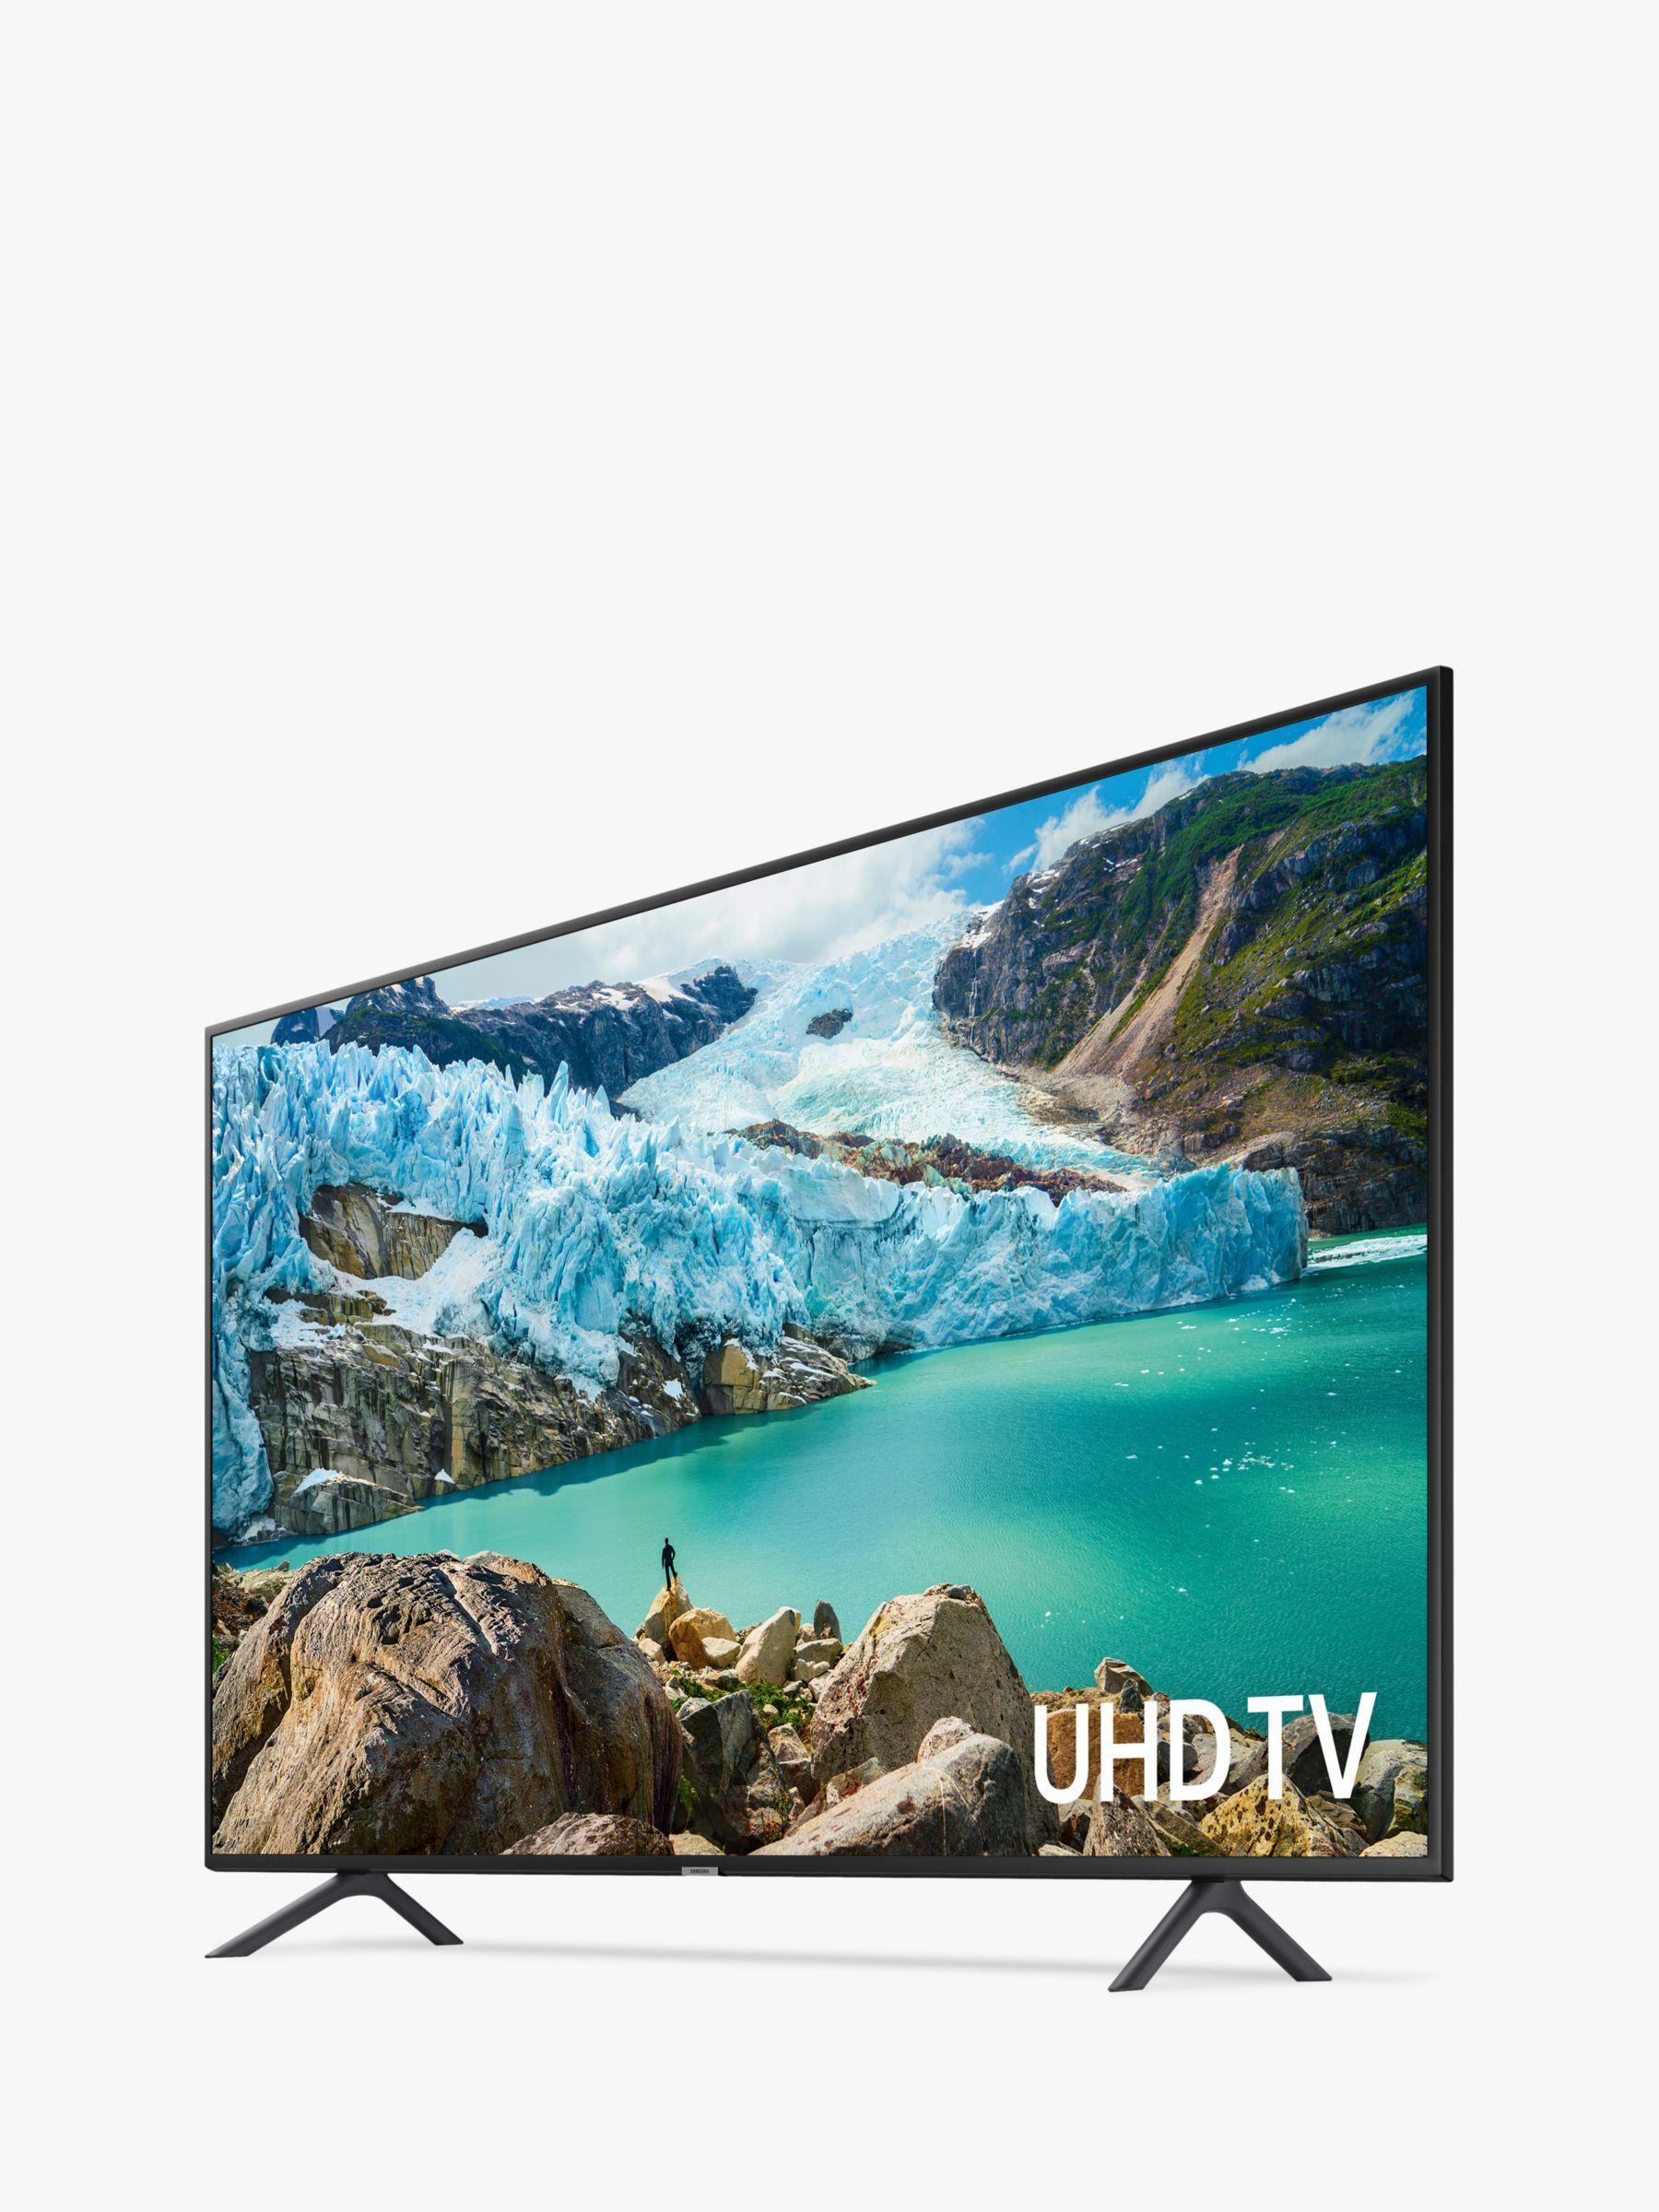 Samsung Ue55ru7100 2019 Hdr 4k Ultra Hd Smart Tv 55 With Tvplus